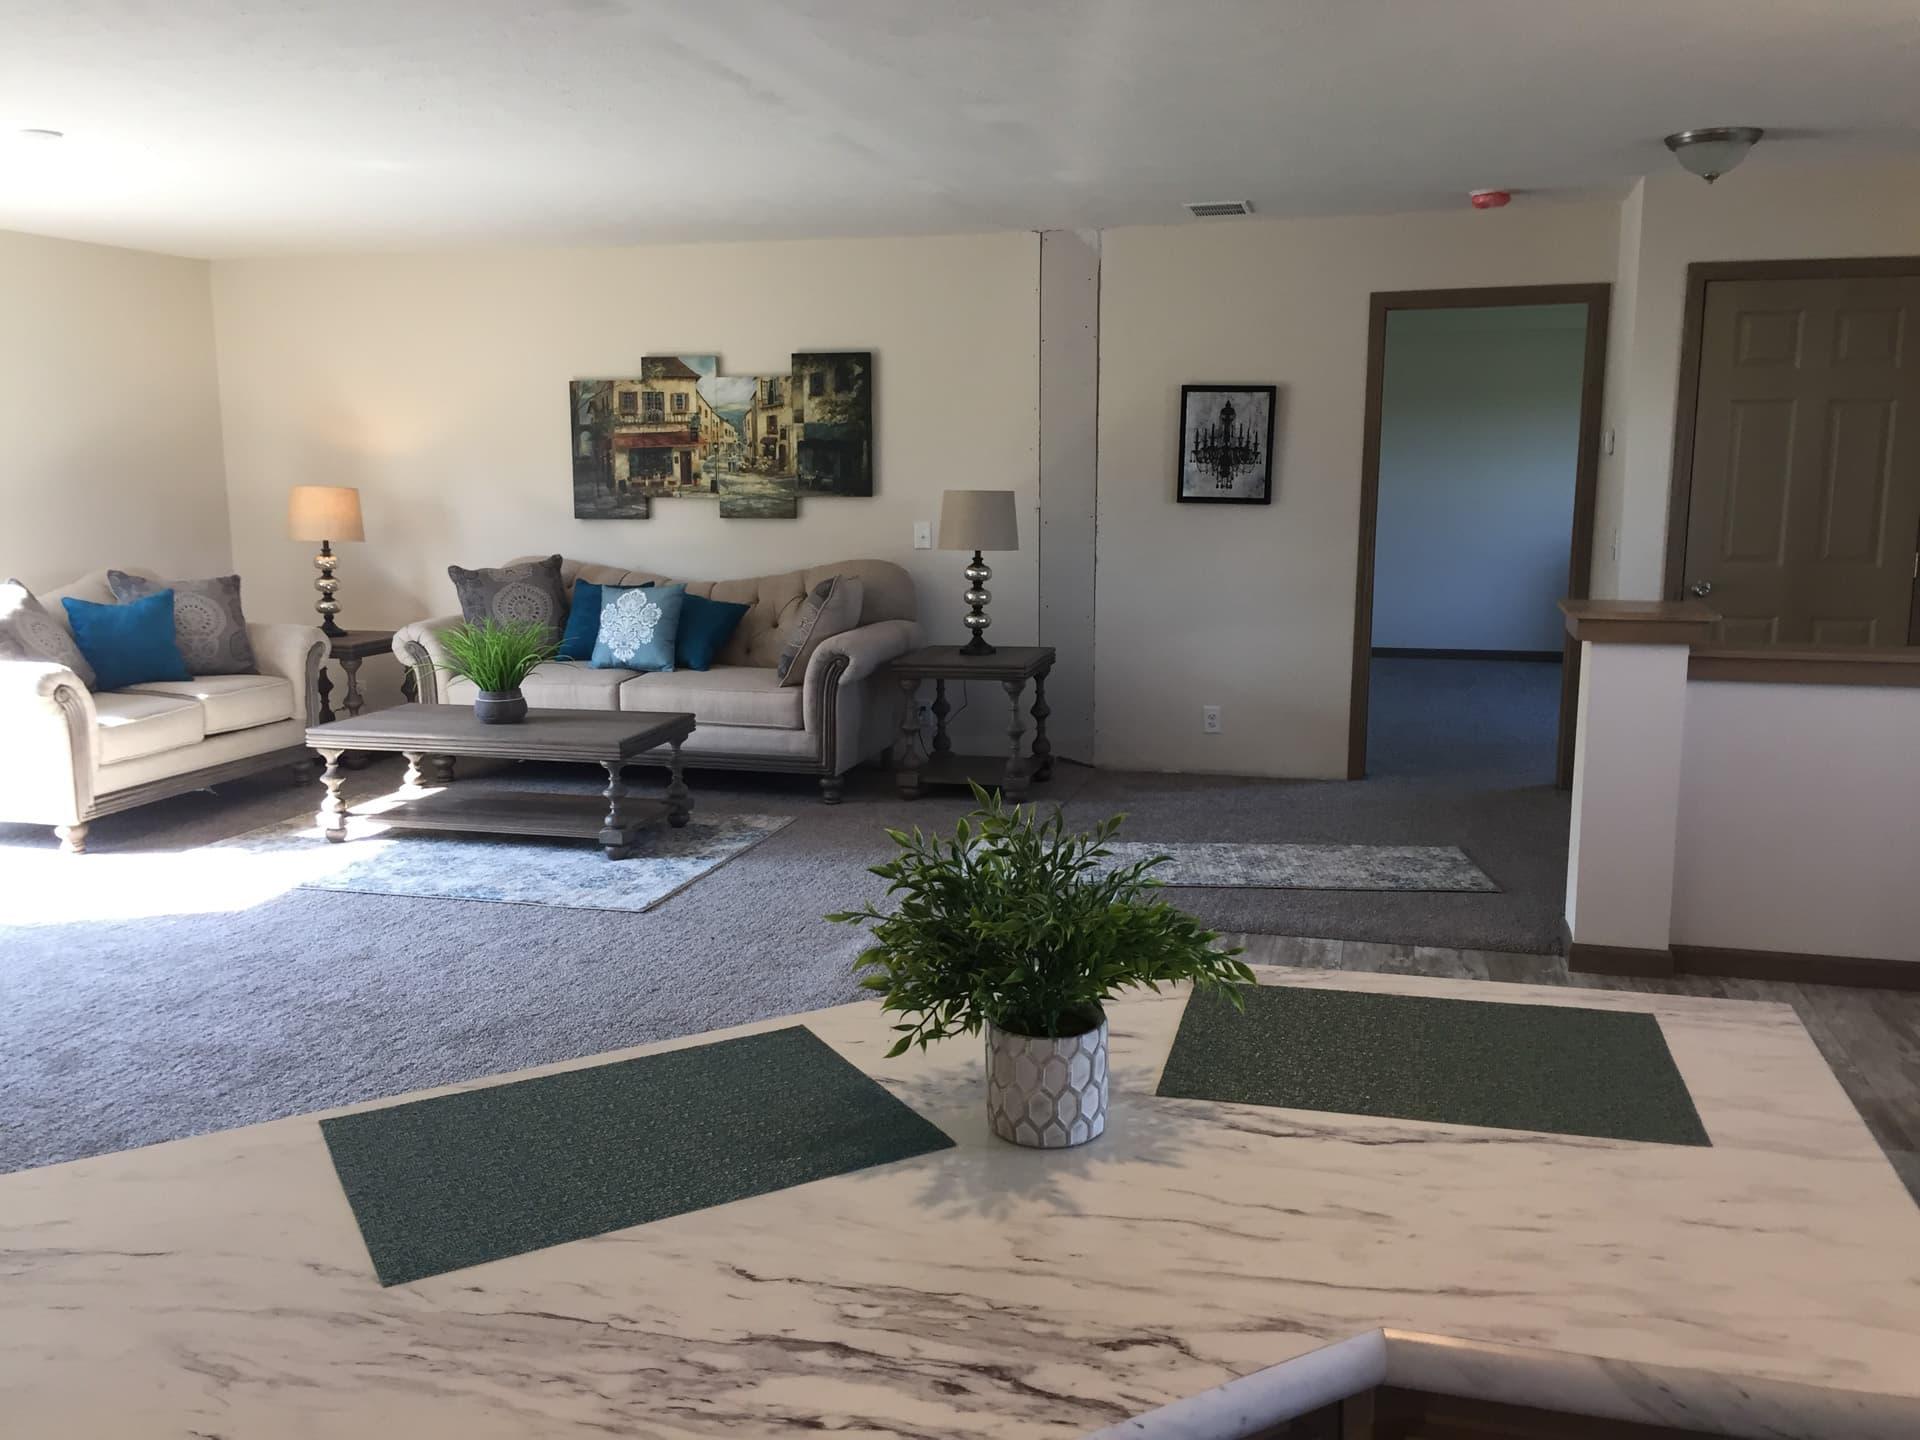 Champion Barton DM6005 Living Room (2)